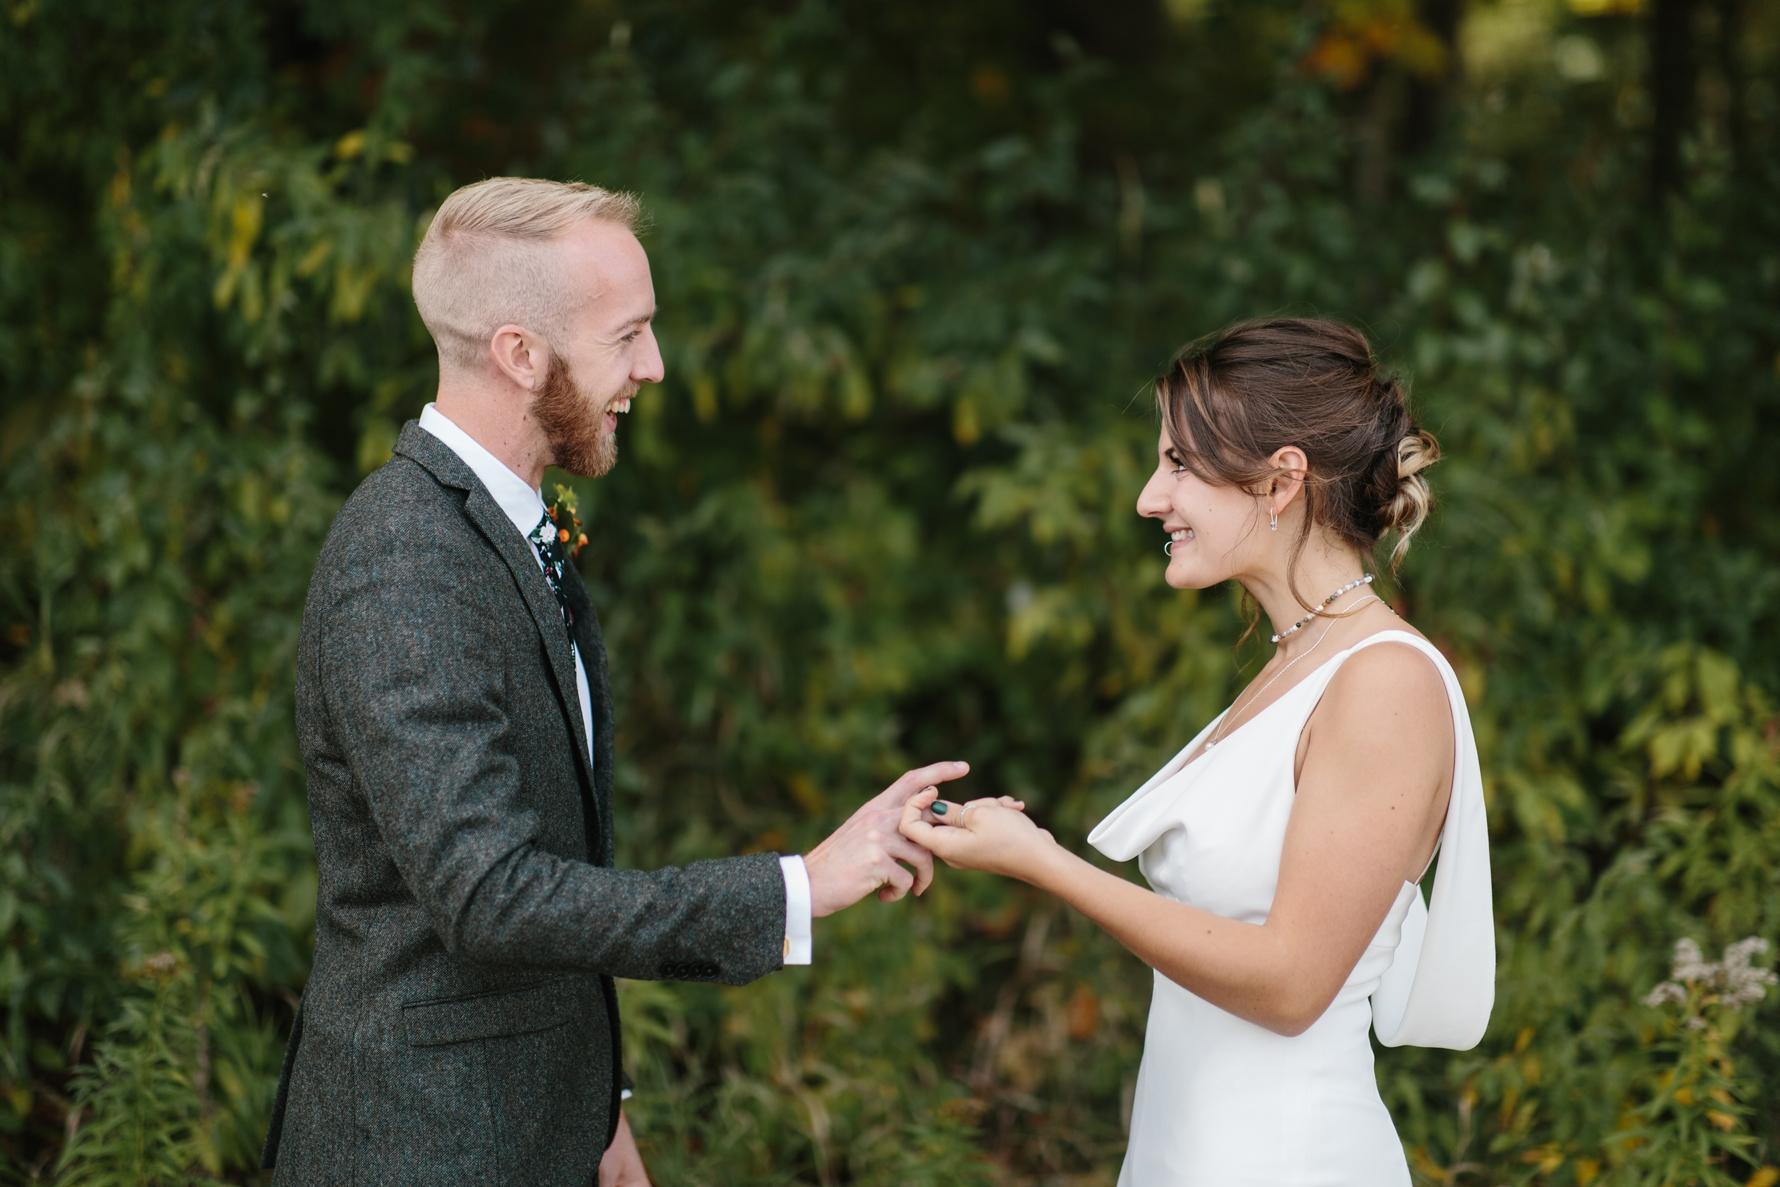 norris-traverse-city-wedding-15.JPG